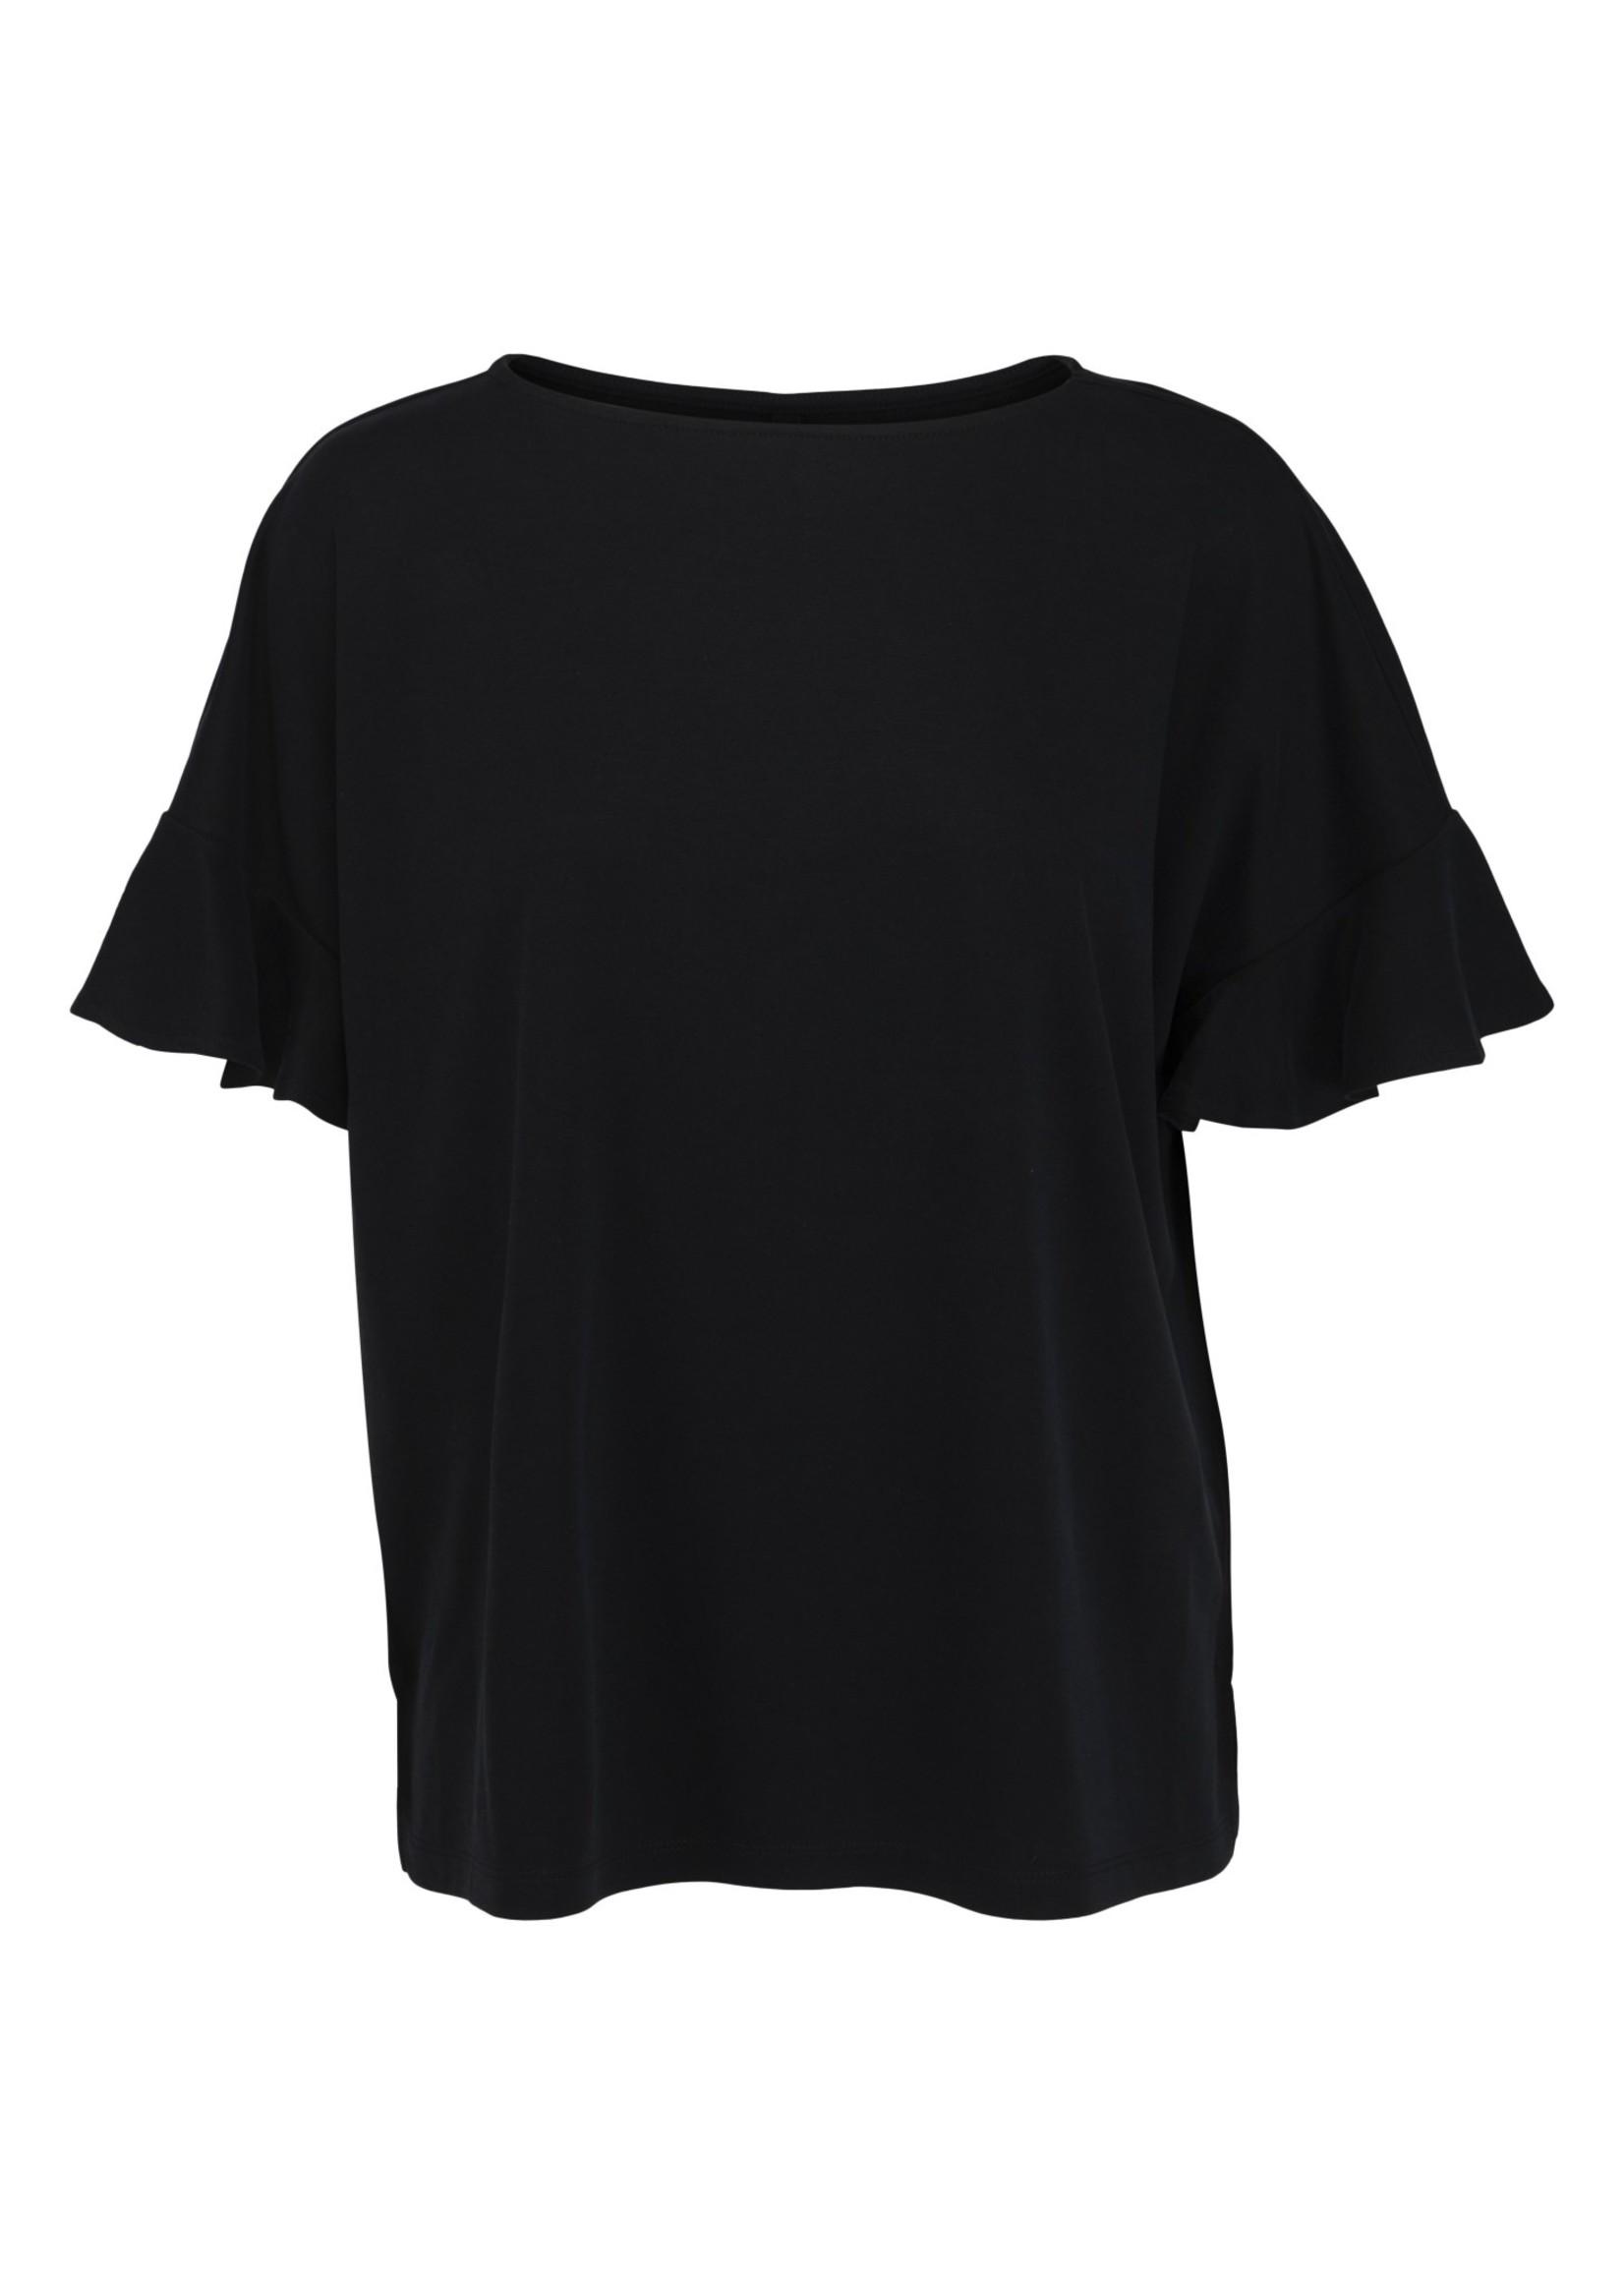 PEPPERCORN Reeta Blouse BLACK